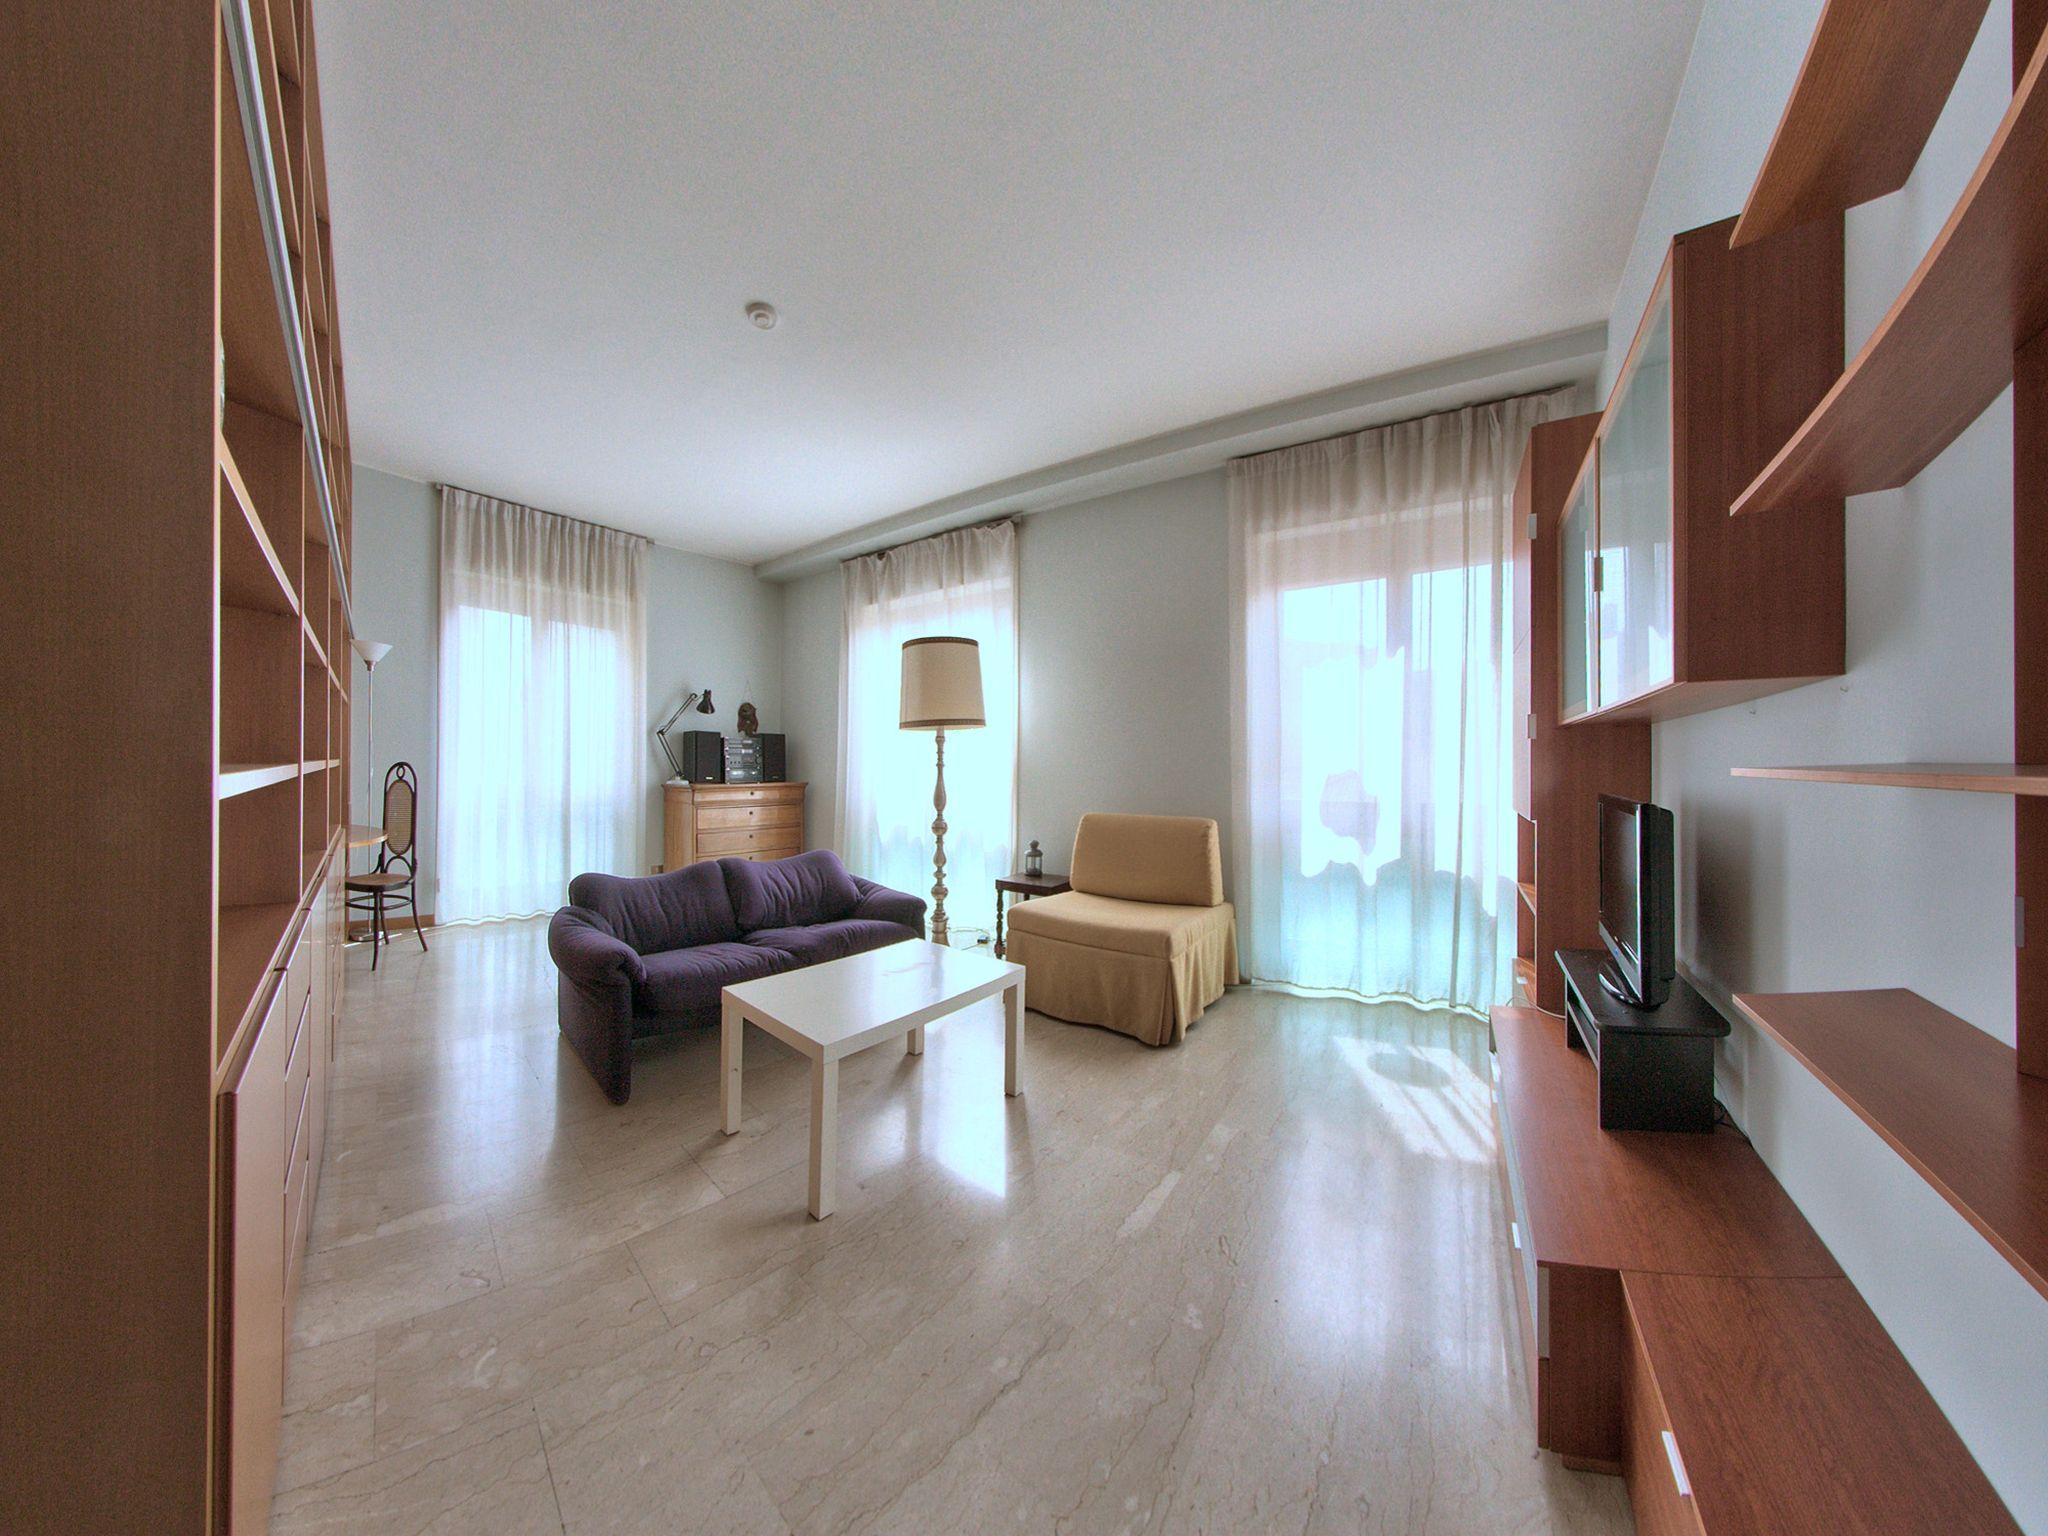 Milan - Apartment Palestrina 2BR